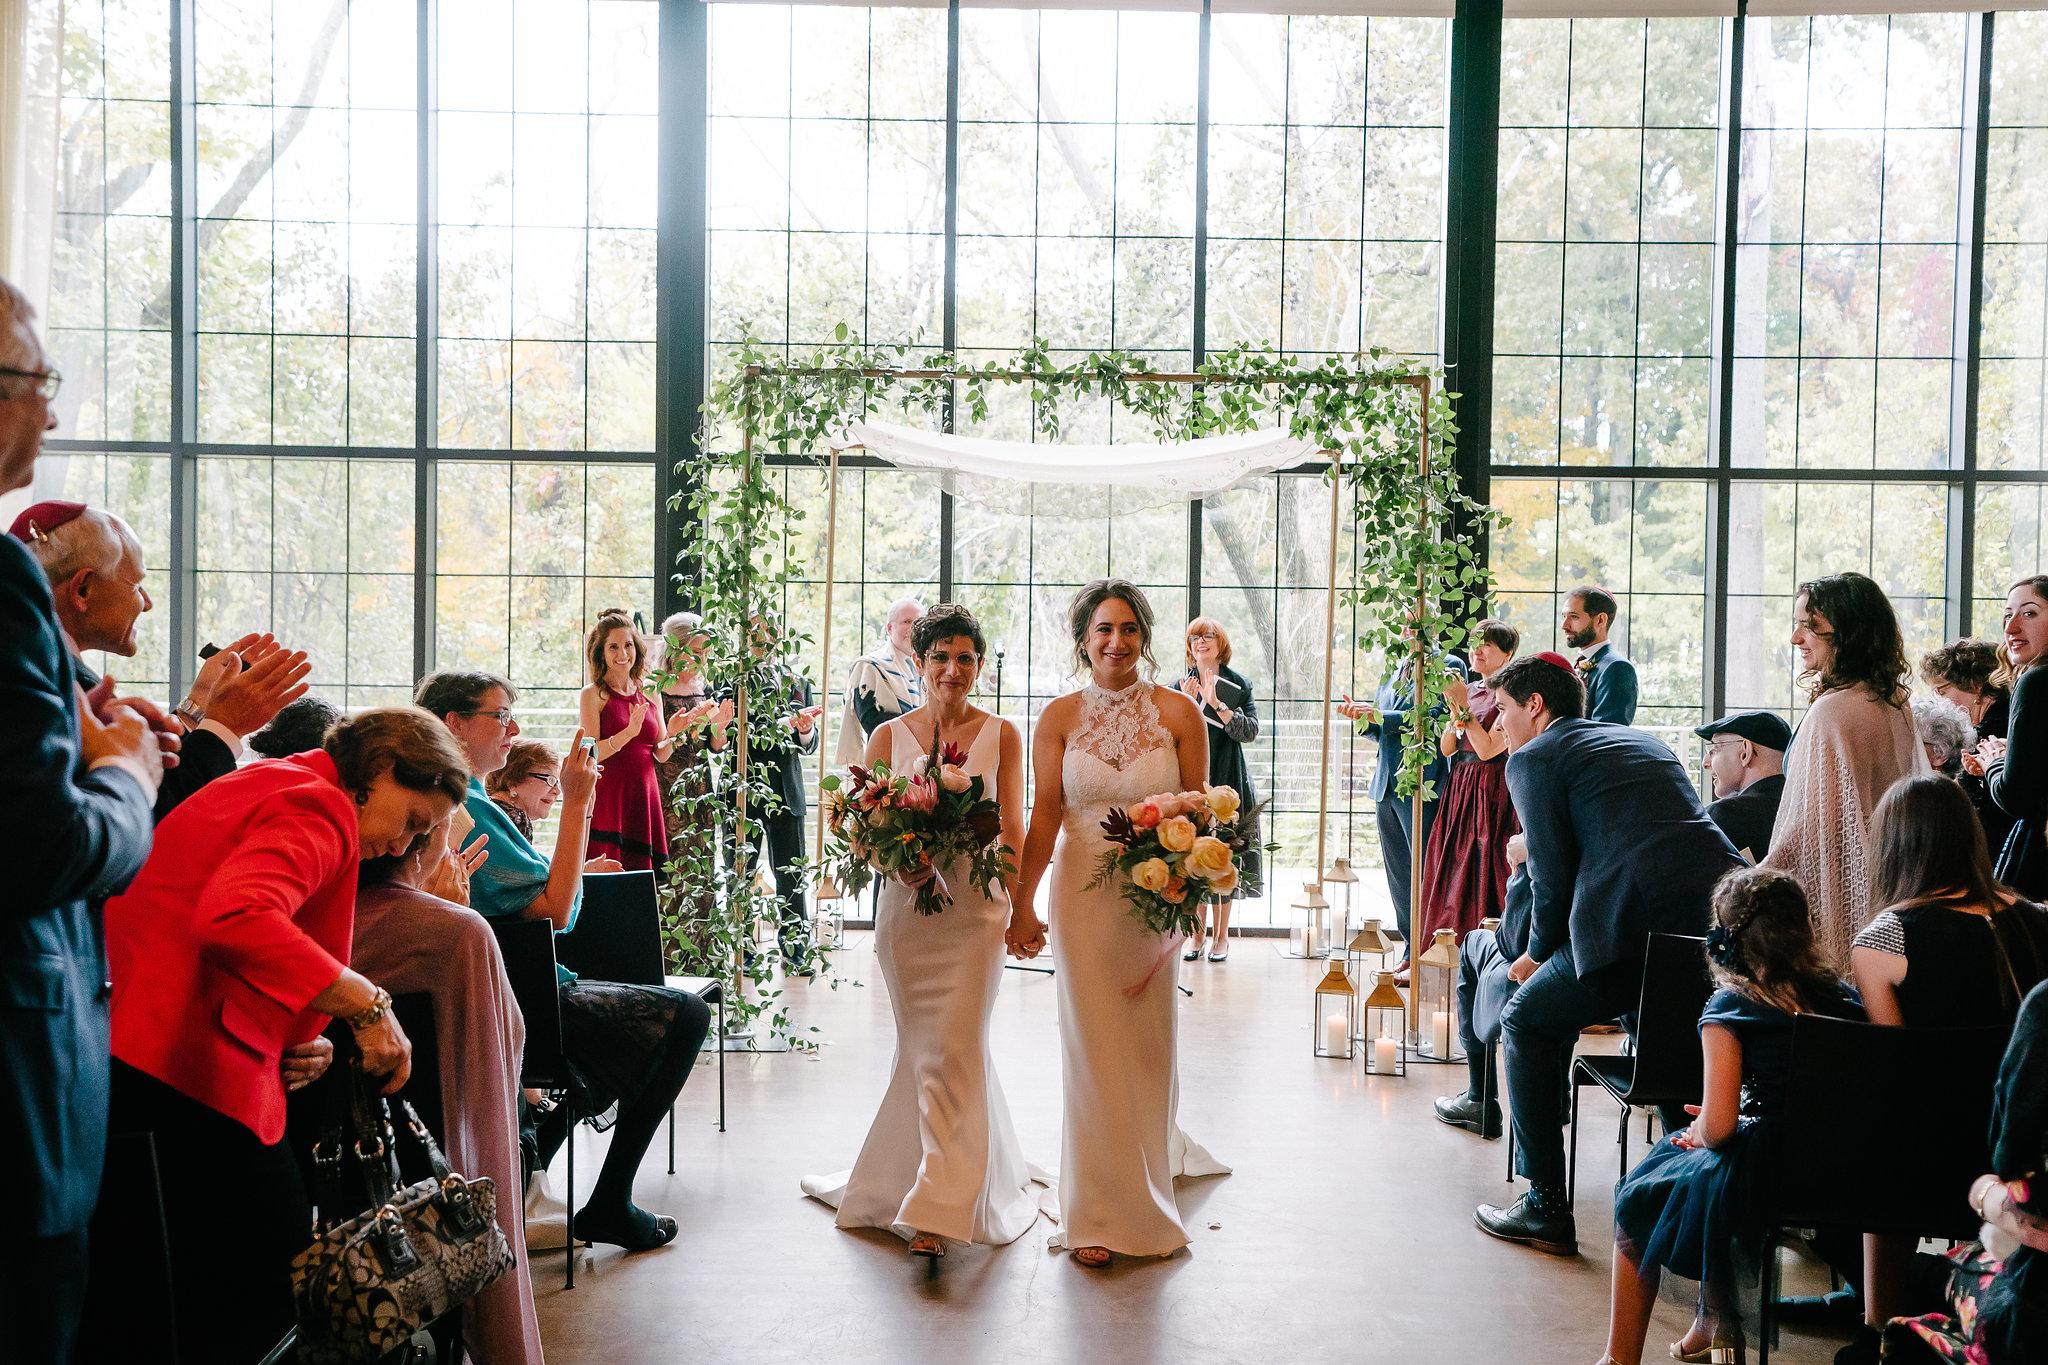 jess-elissa-wedding-604.jpg